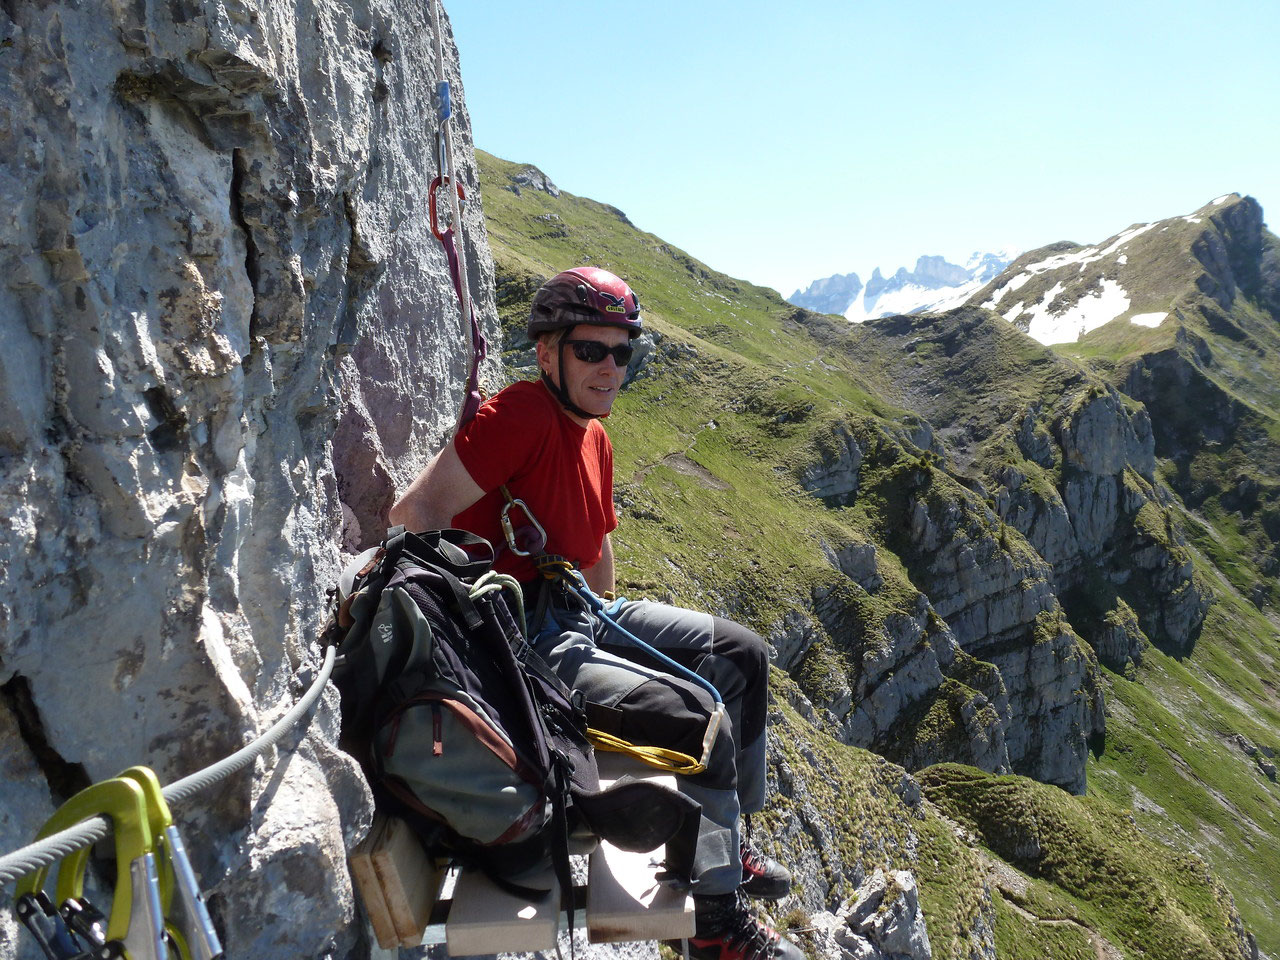 Klettersteig Uri : Klettersteig fruttstägä bergsteigen